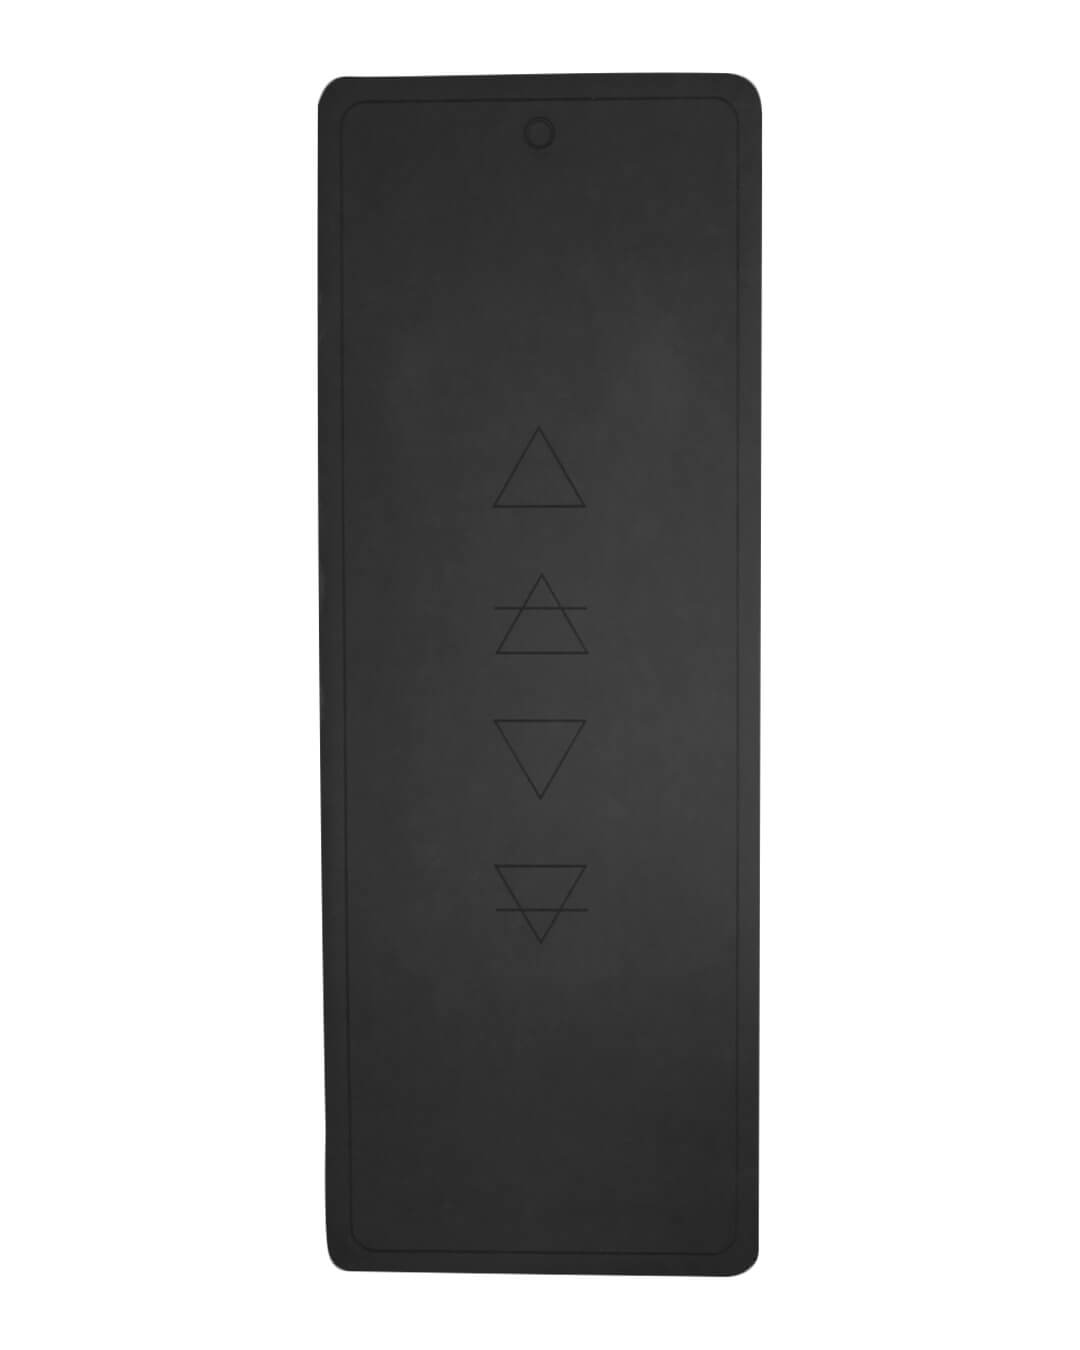 Black Elements Yoga Mat